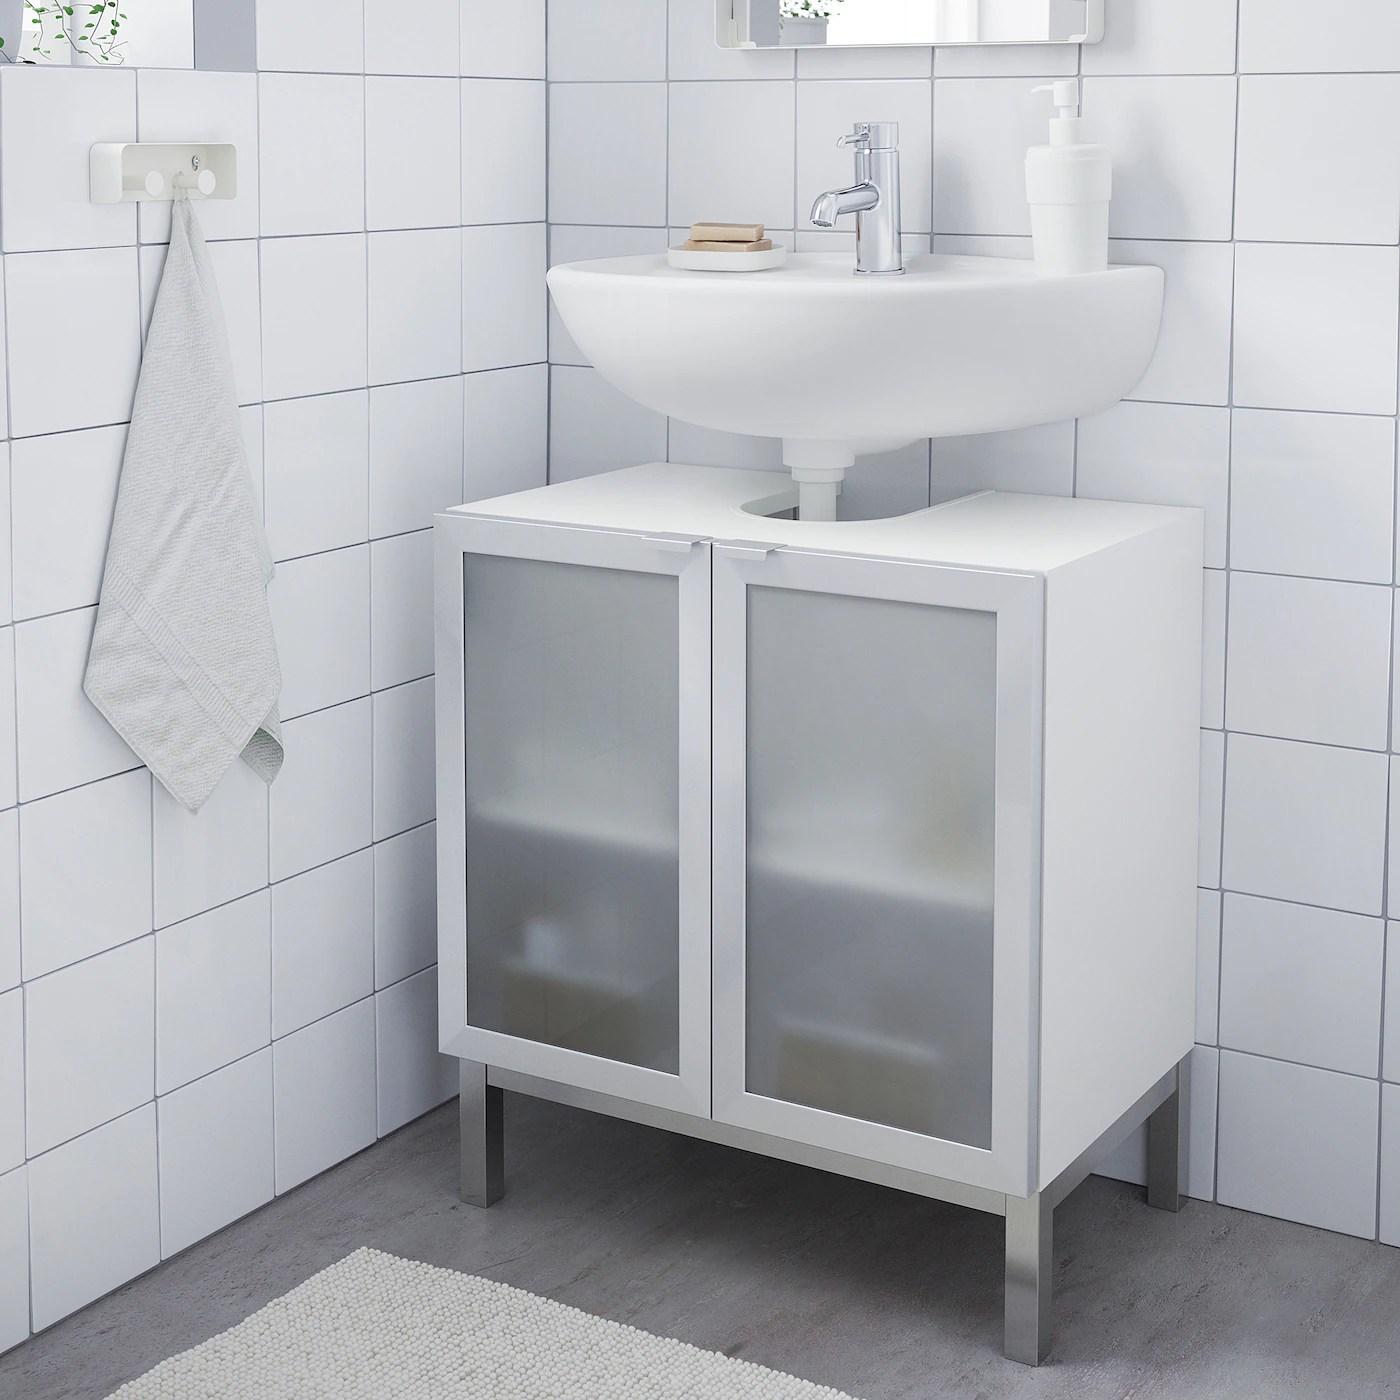 lillangen wash basin base cabinet w 2 doors white aluminium 60x38x51 cm